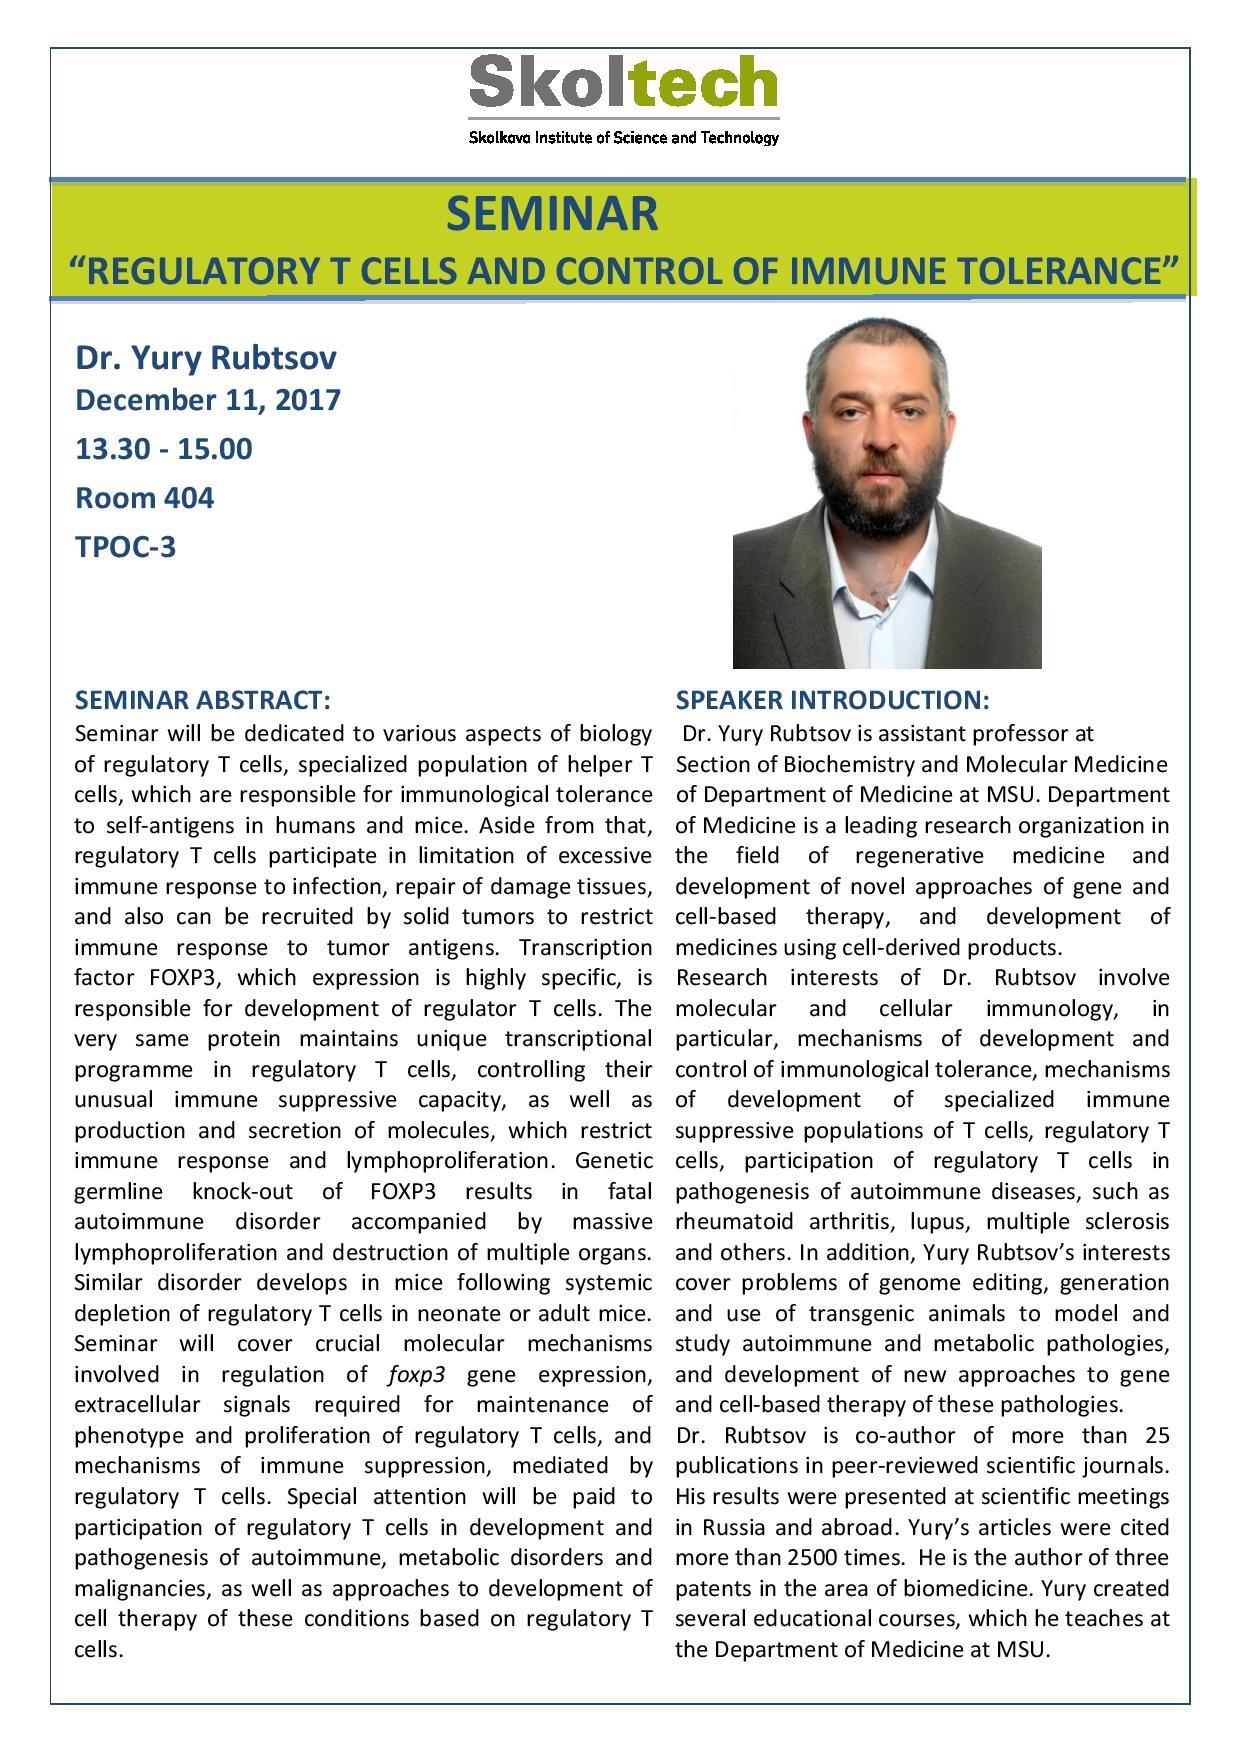 dr-yury-rubtsov-seminar-announcement-page-001